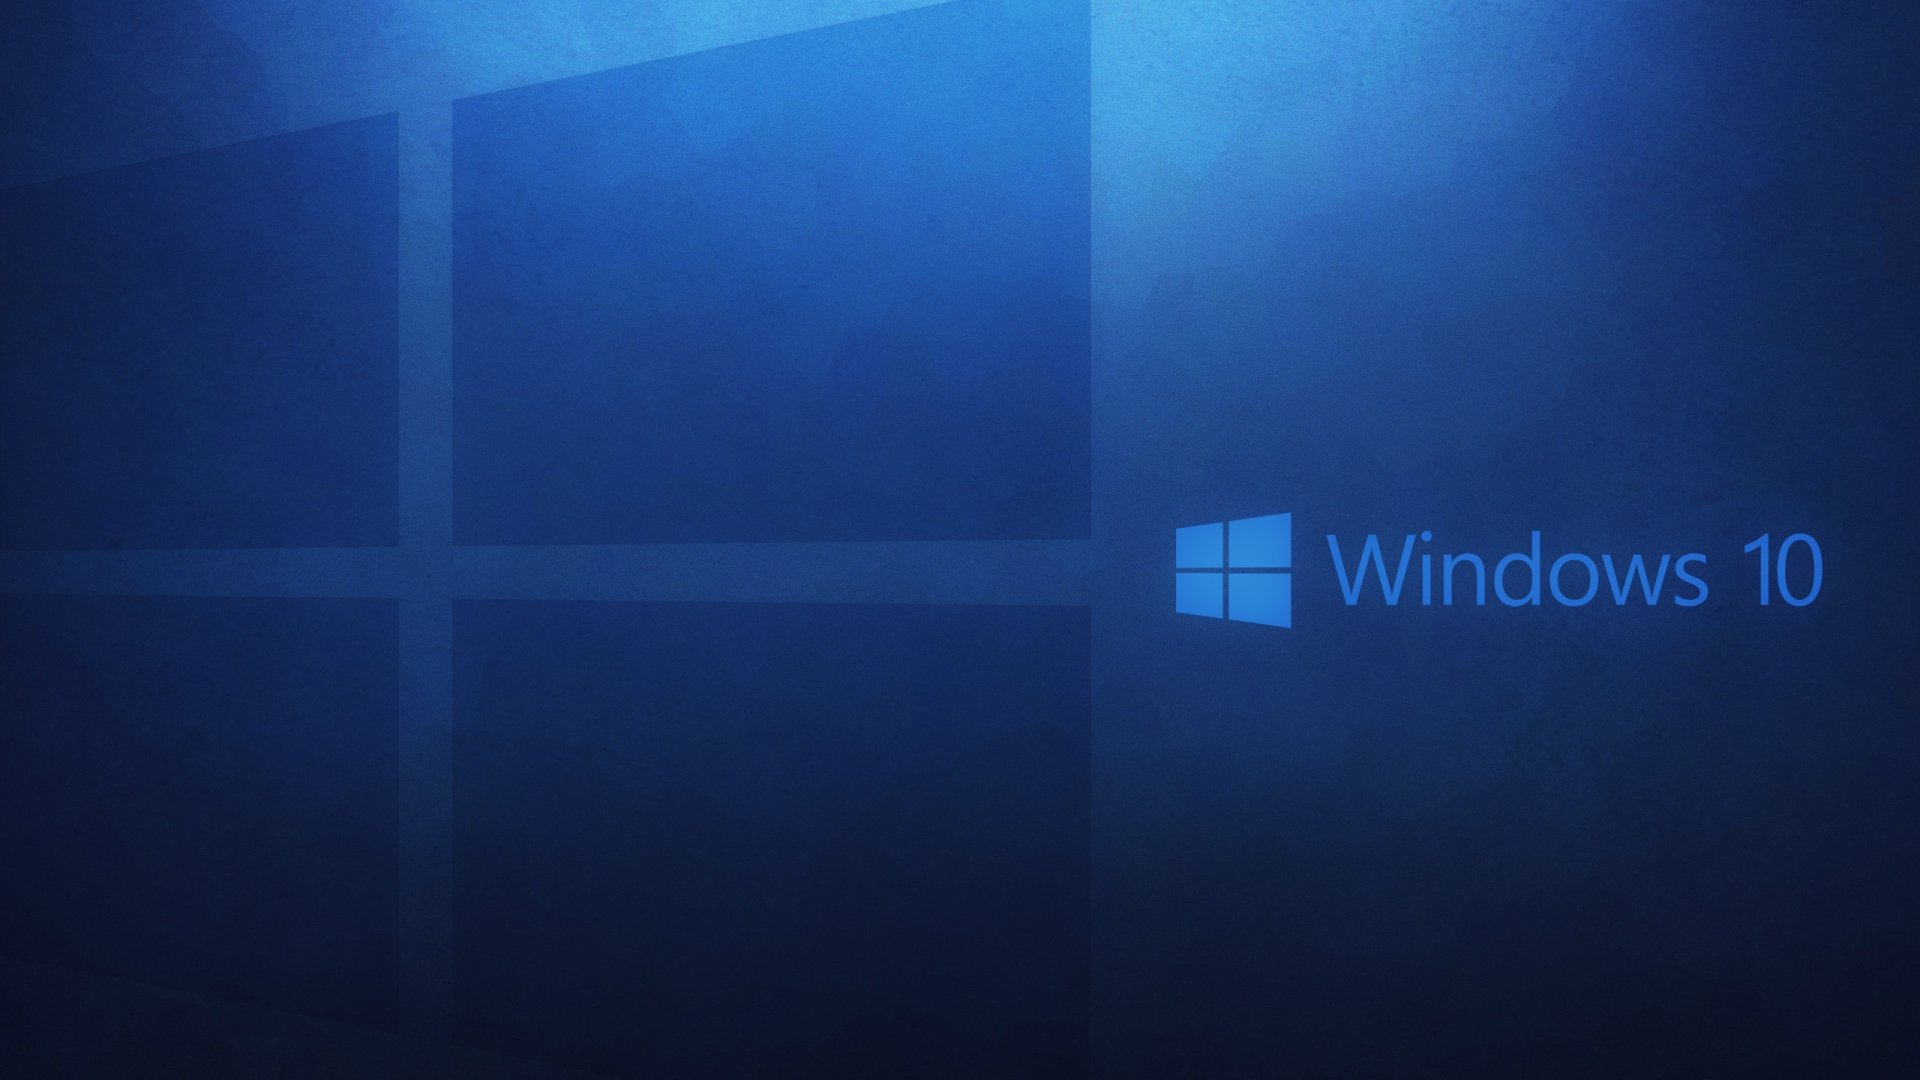 Windows 10 Wallpapers 1920x1080